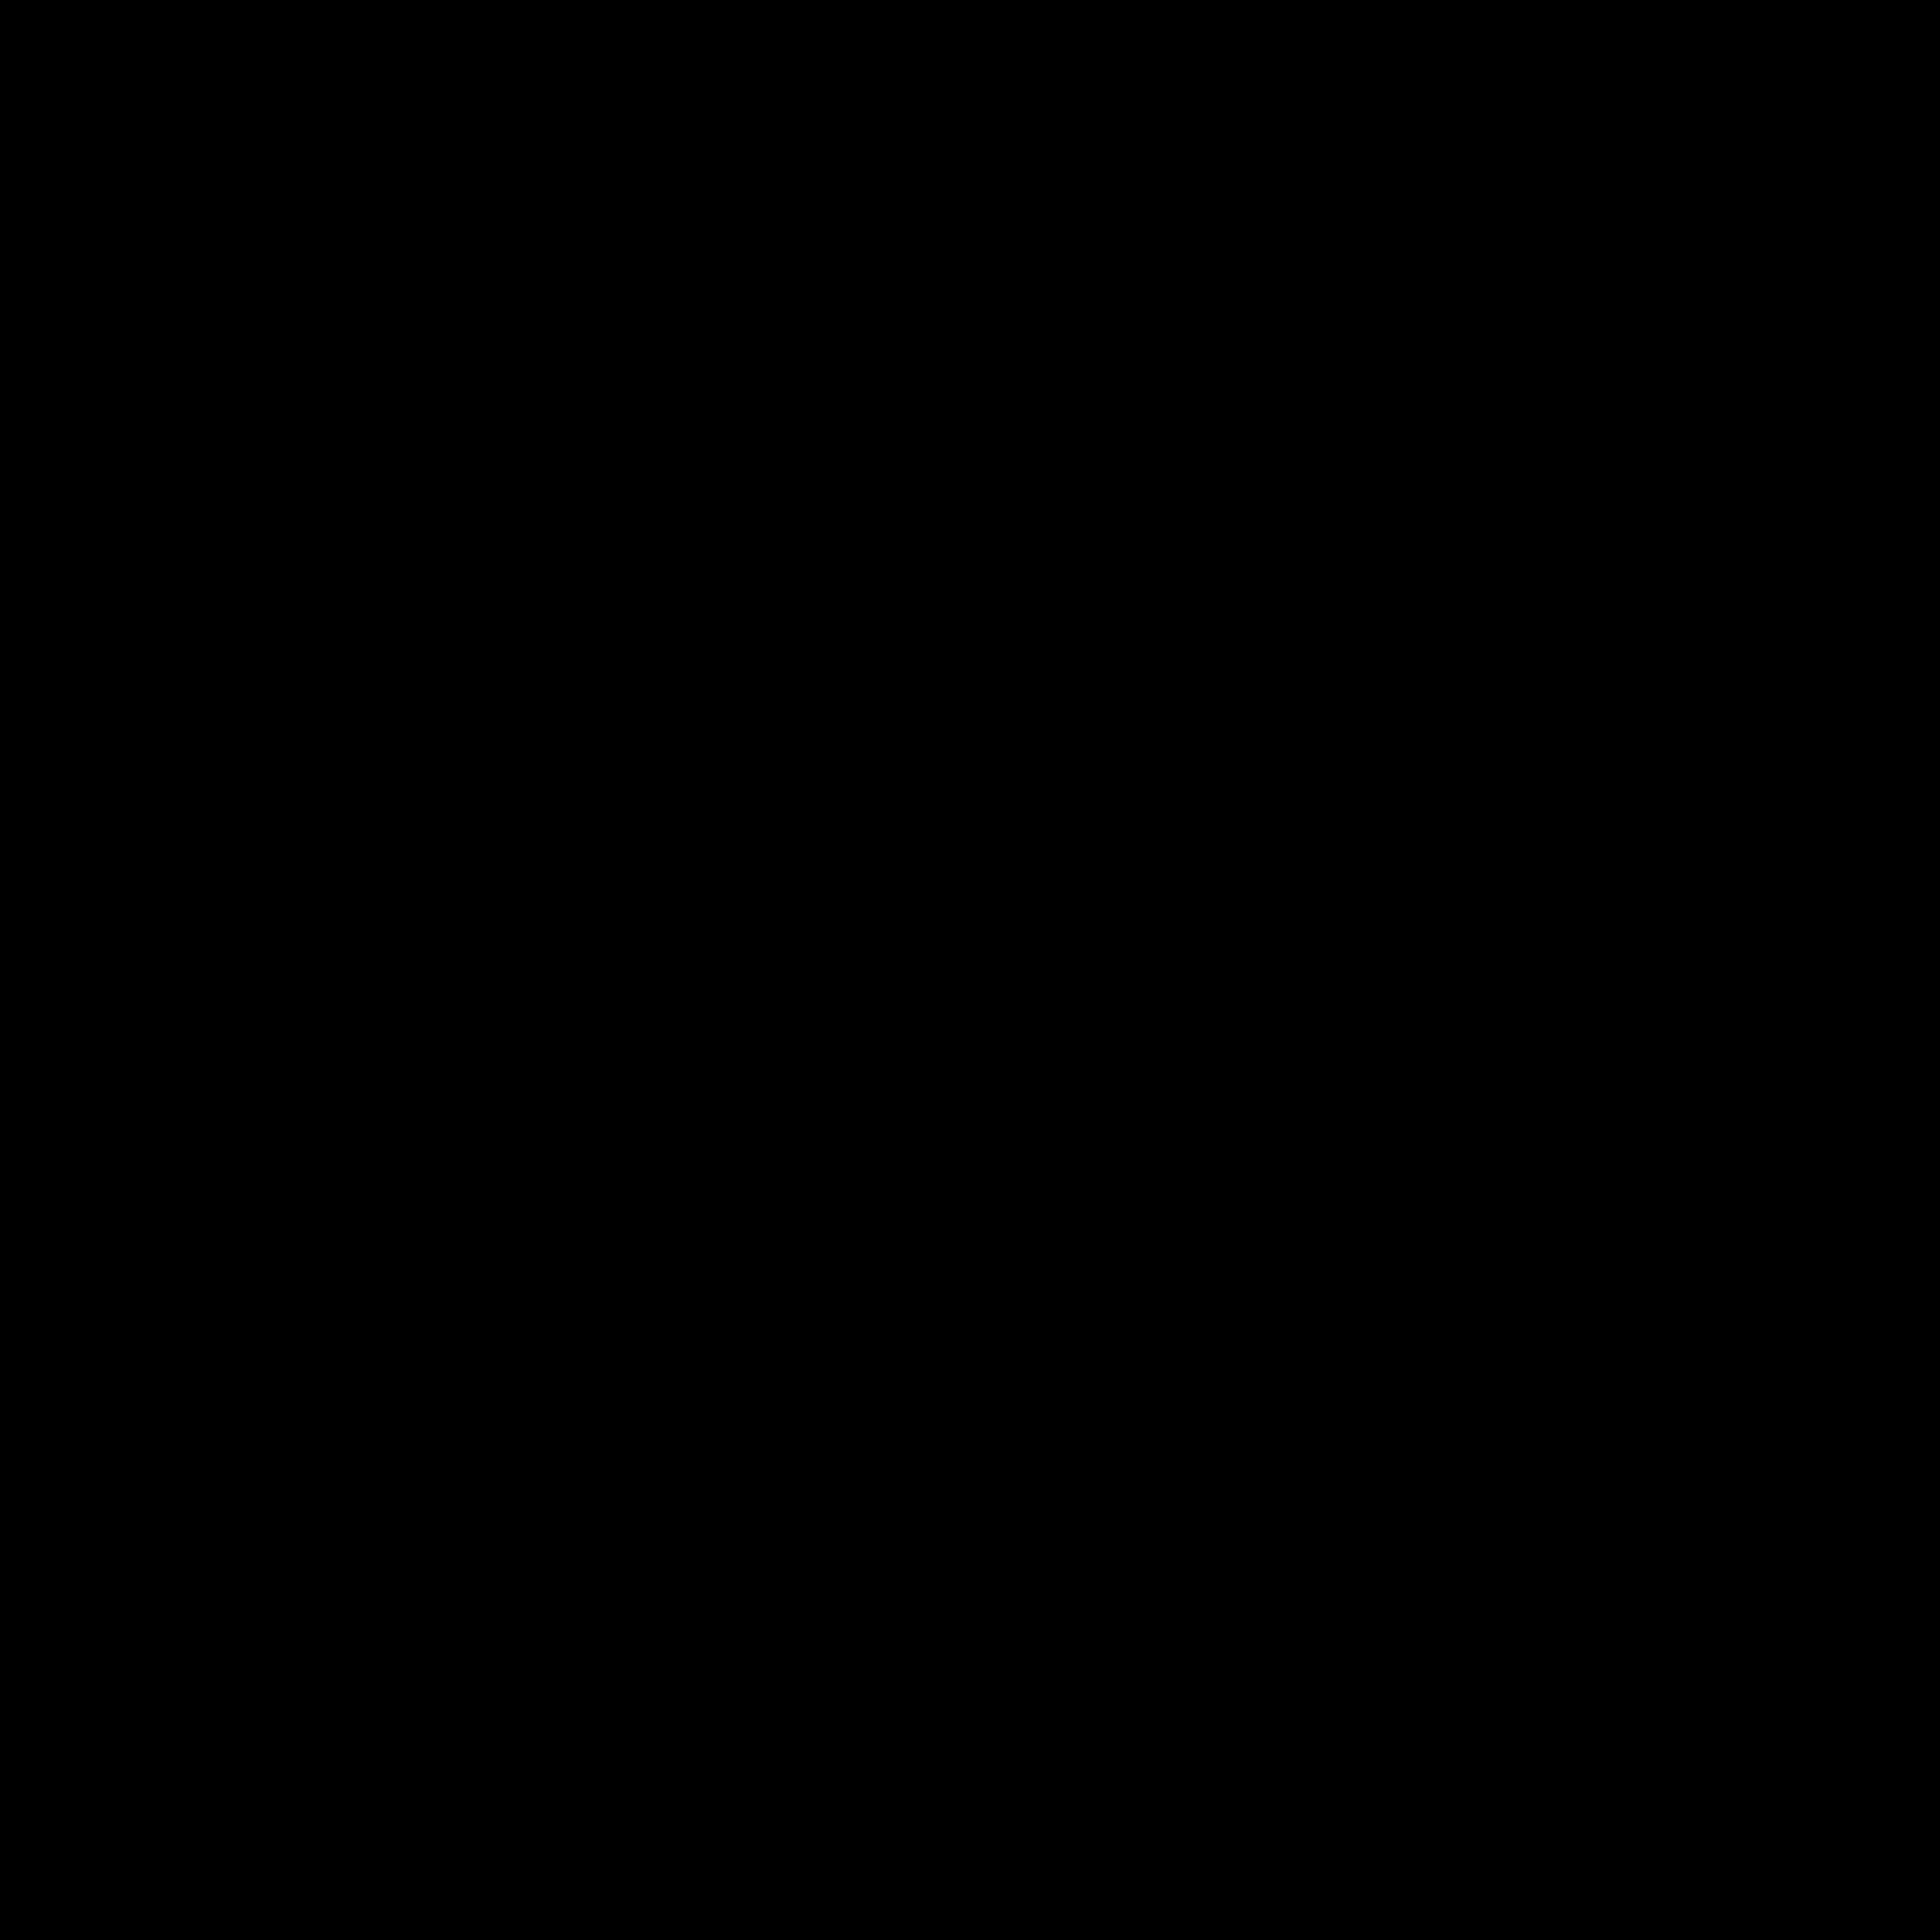 Knights of Columbus Logo PNG Transparent & SVG Vector.